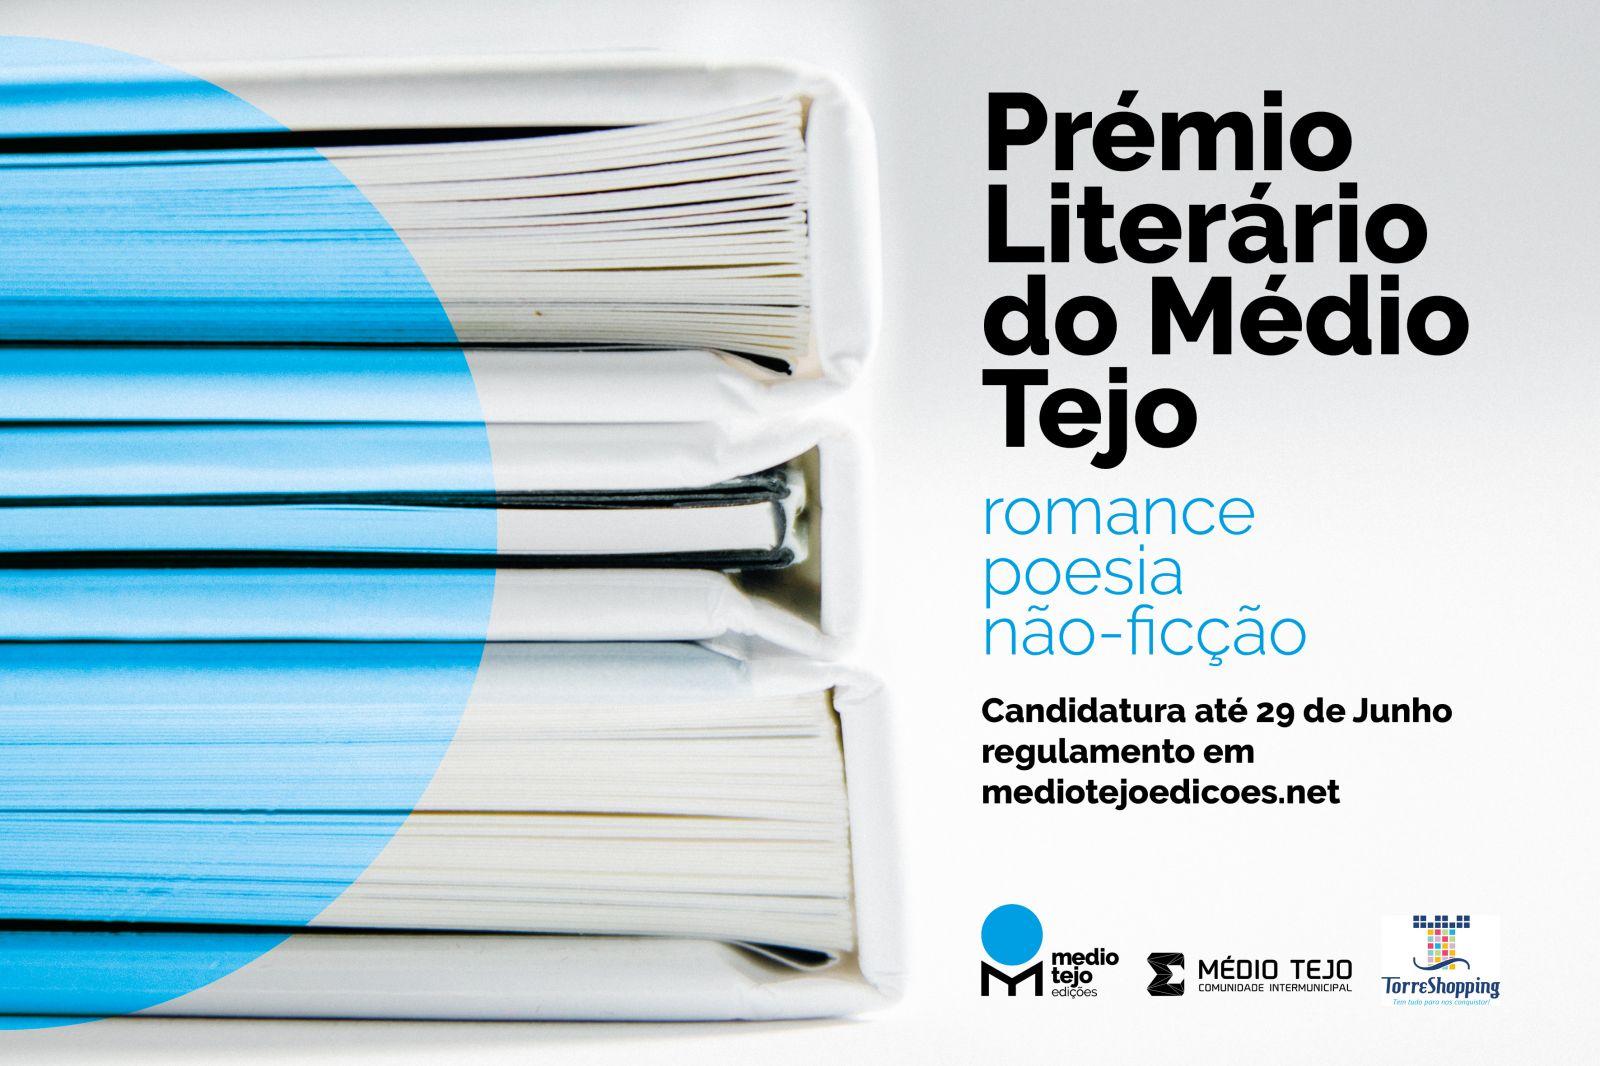 Prémio Literário do Médio Tejo 2018